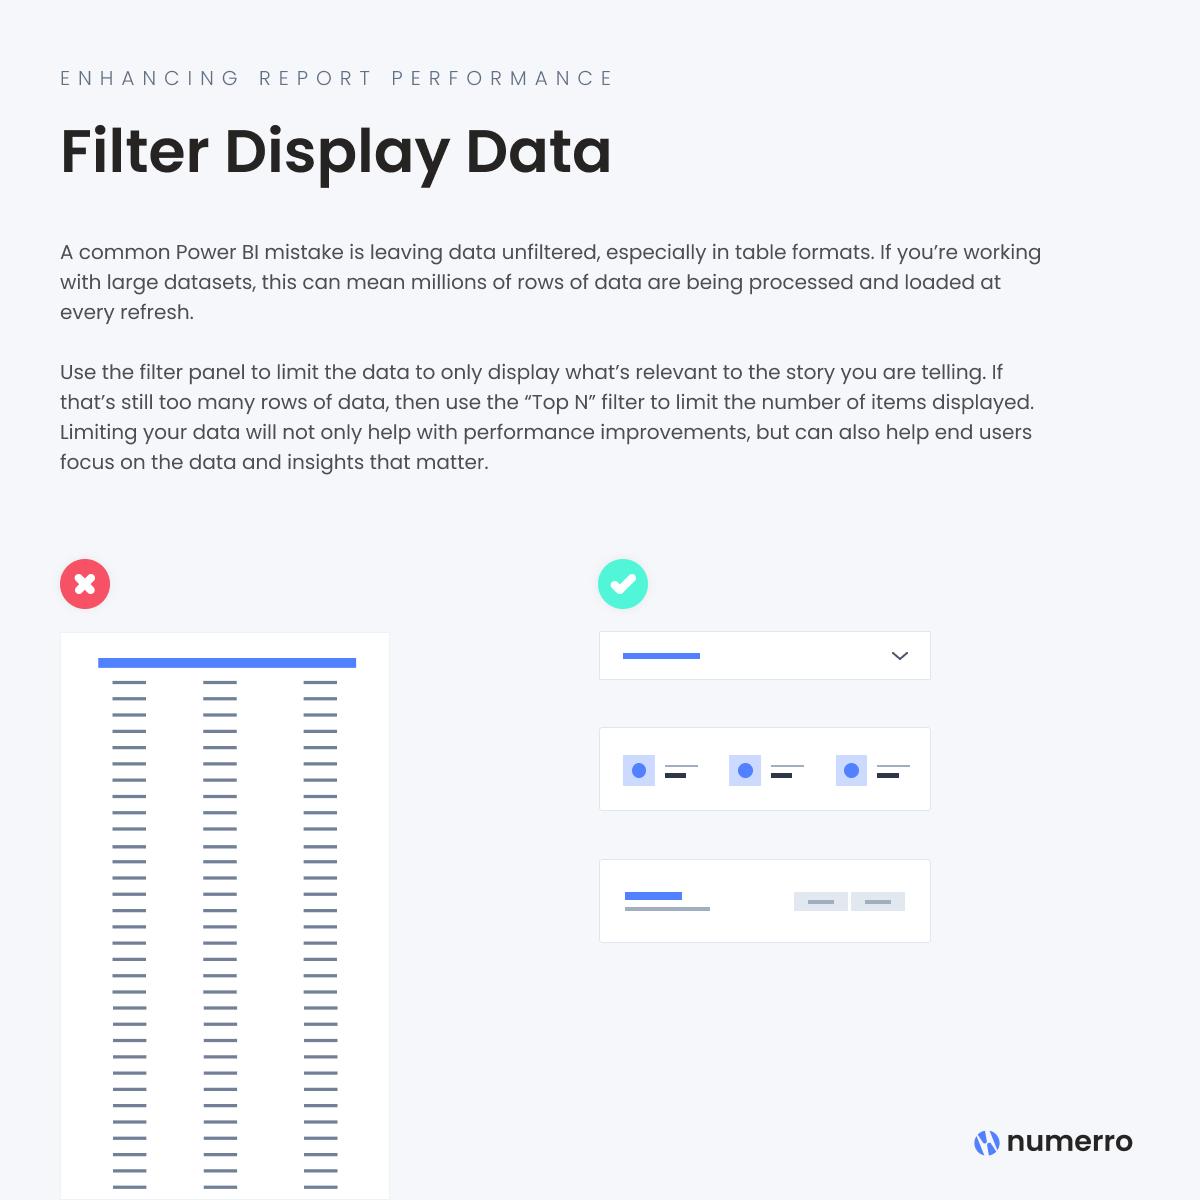 Enhancing Report Performance -Filter Display Data